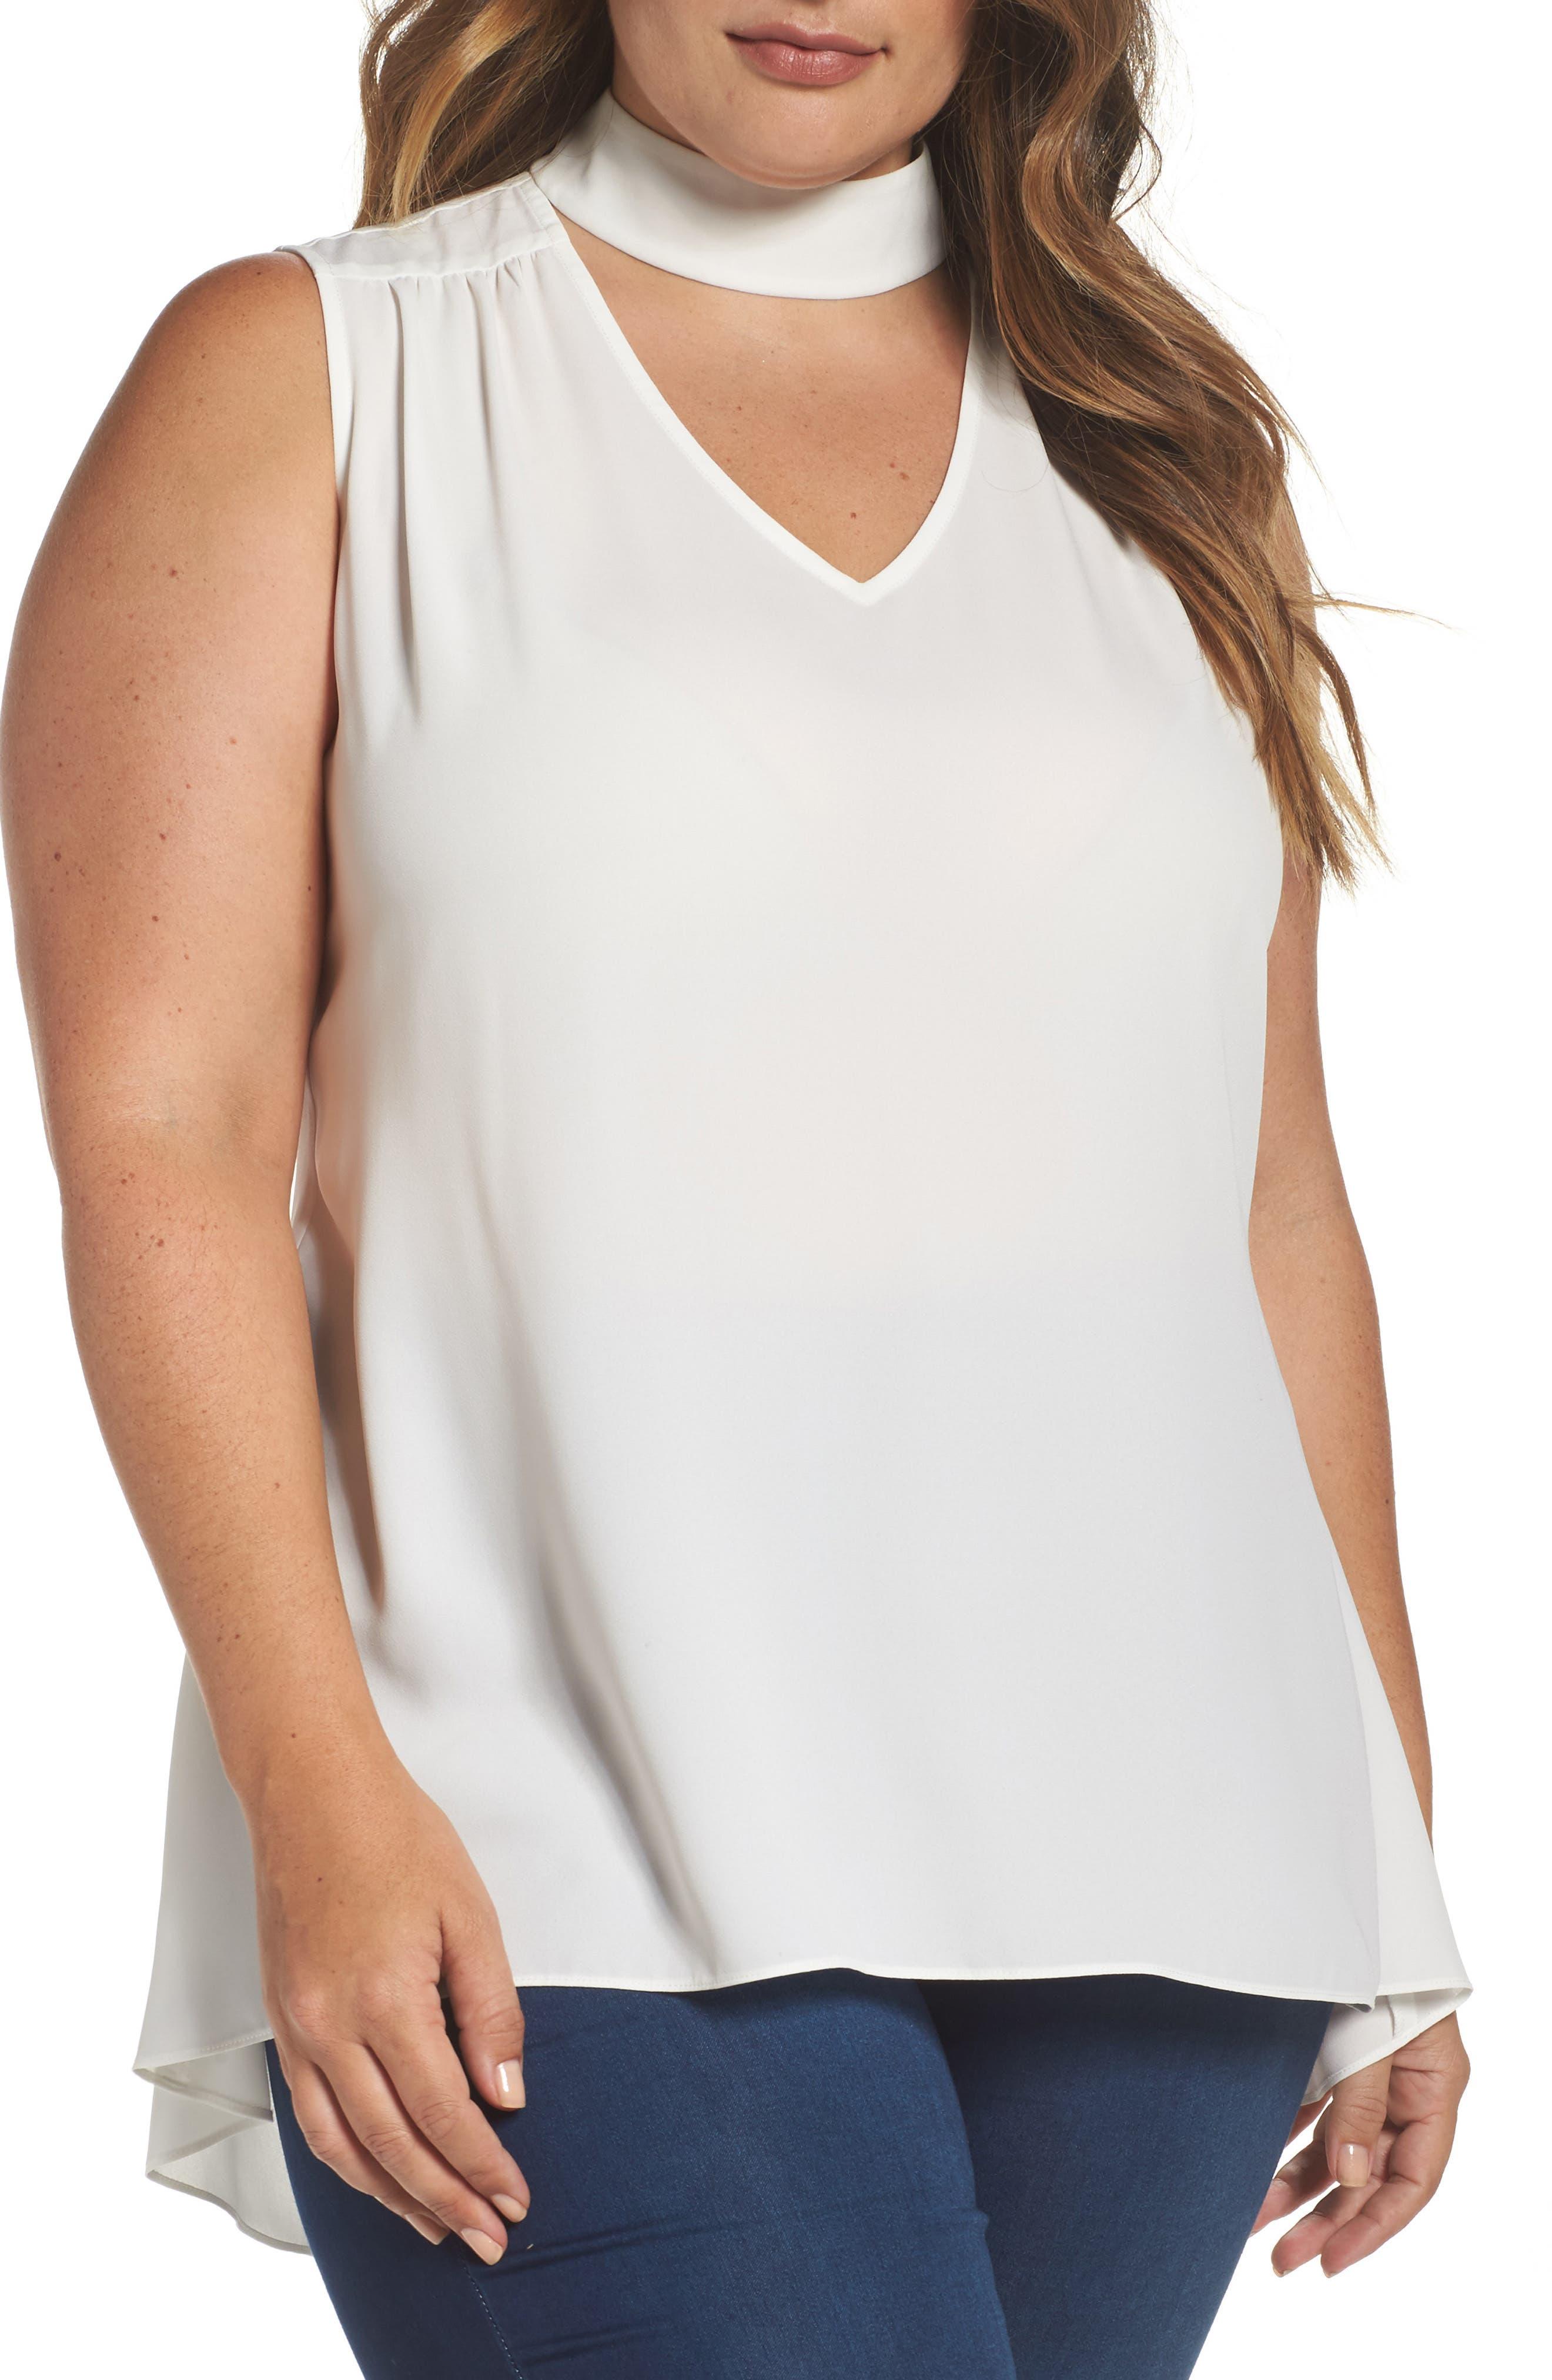 Vince Camuto Choker Neck Top (Plus Size)